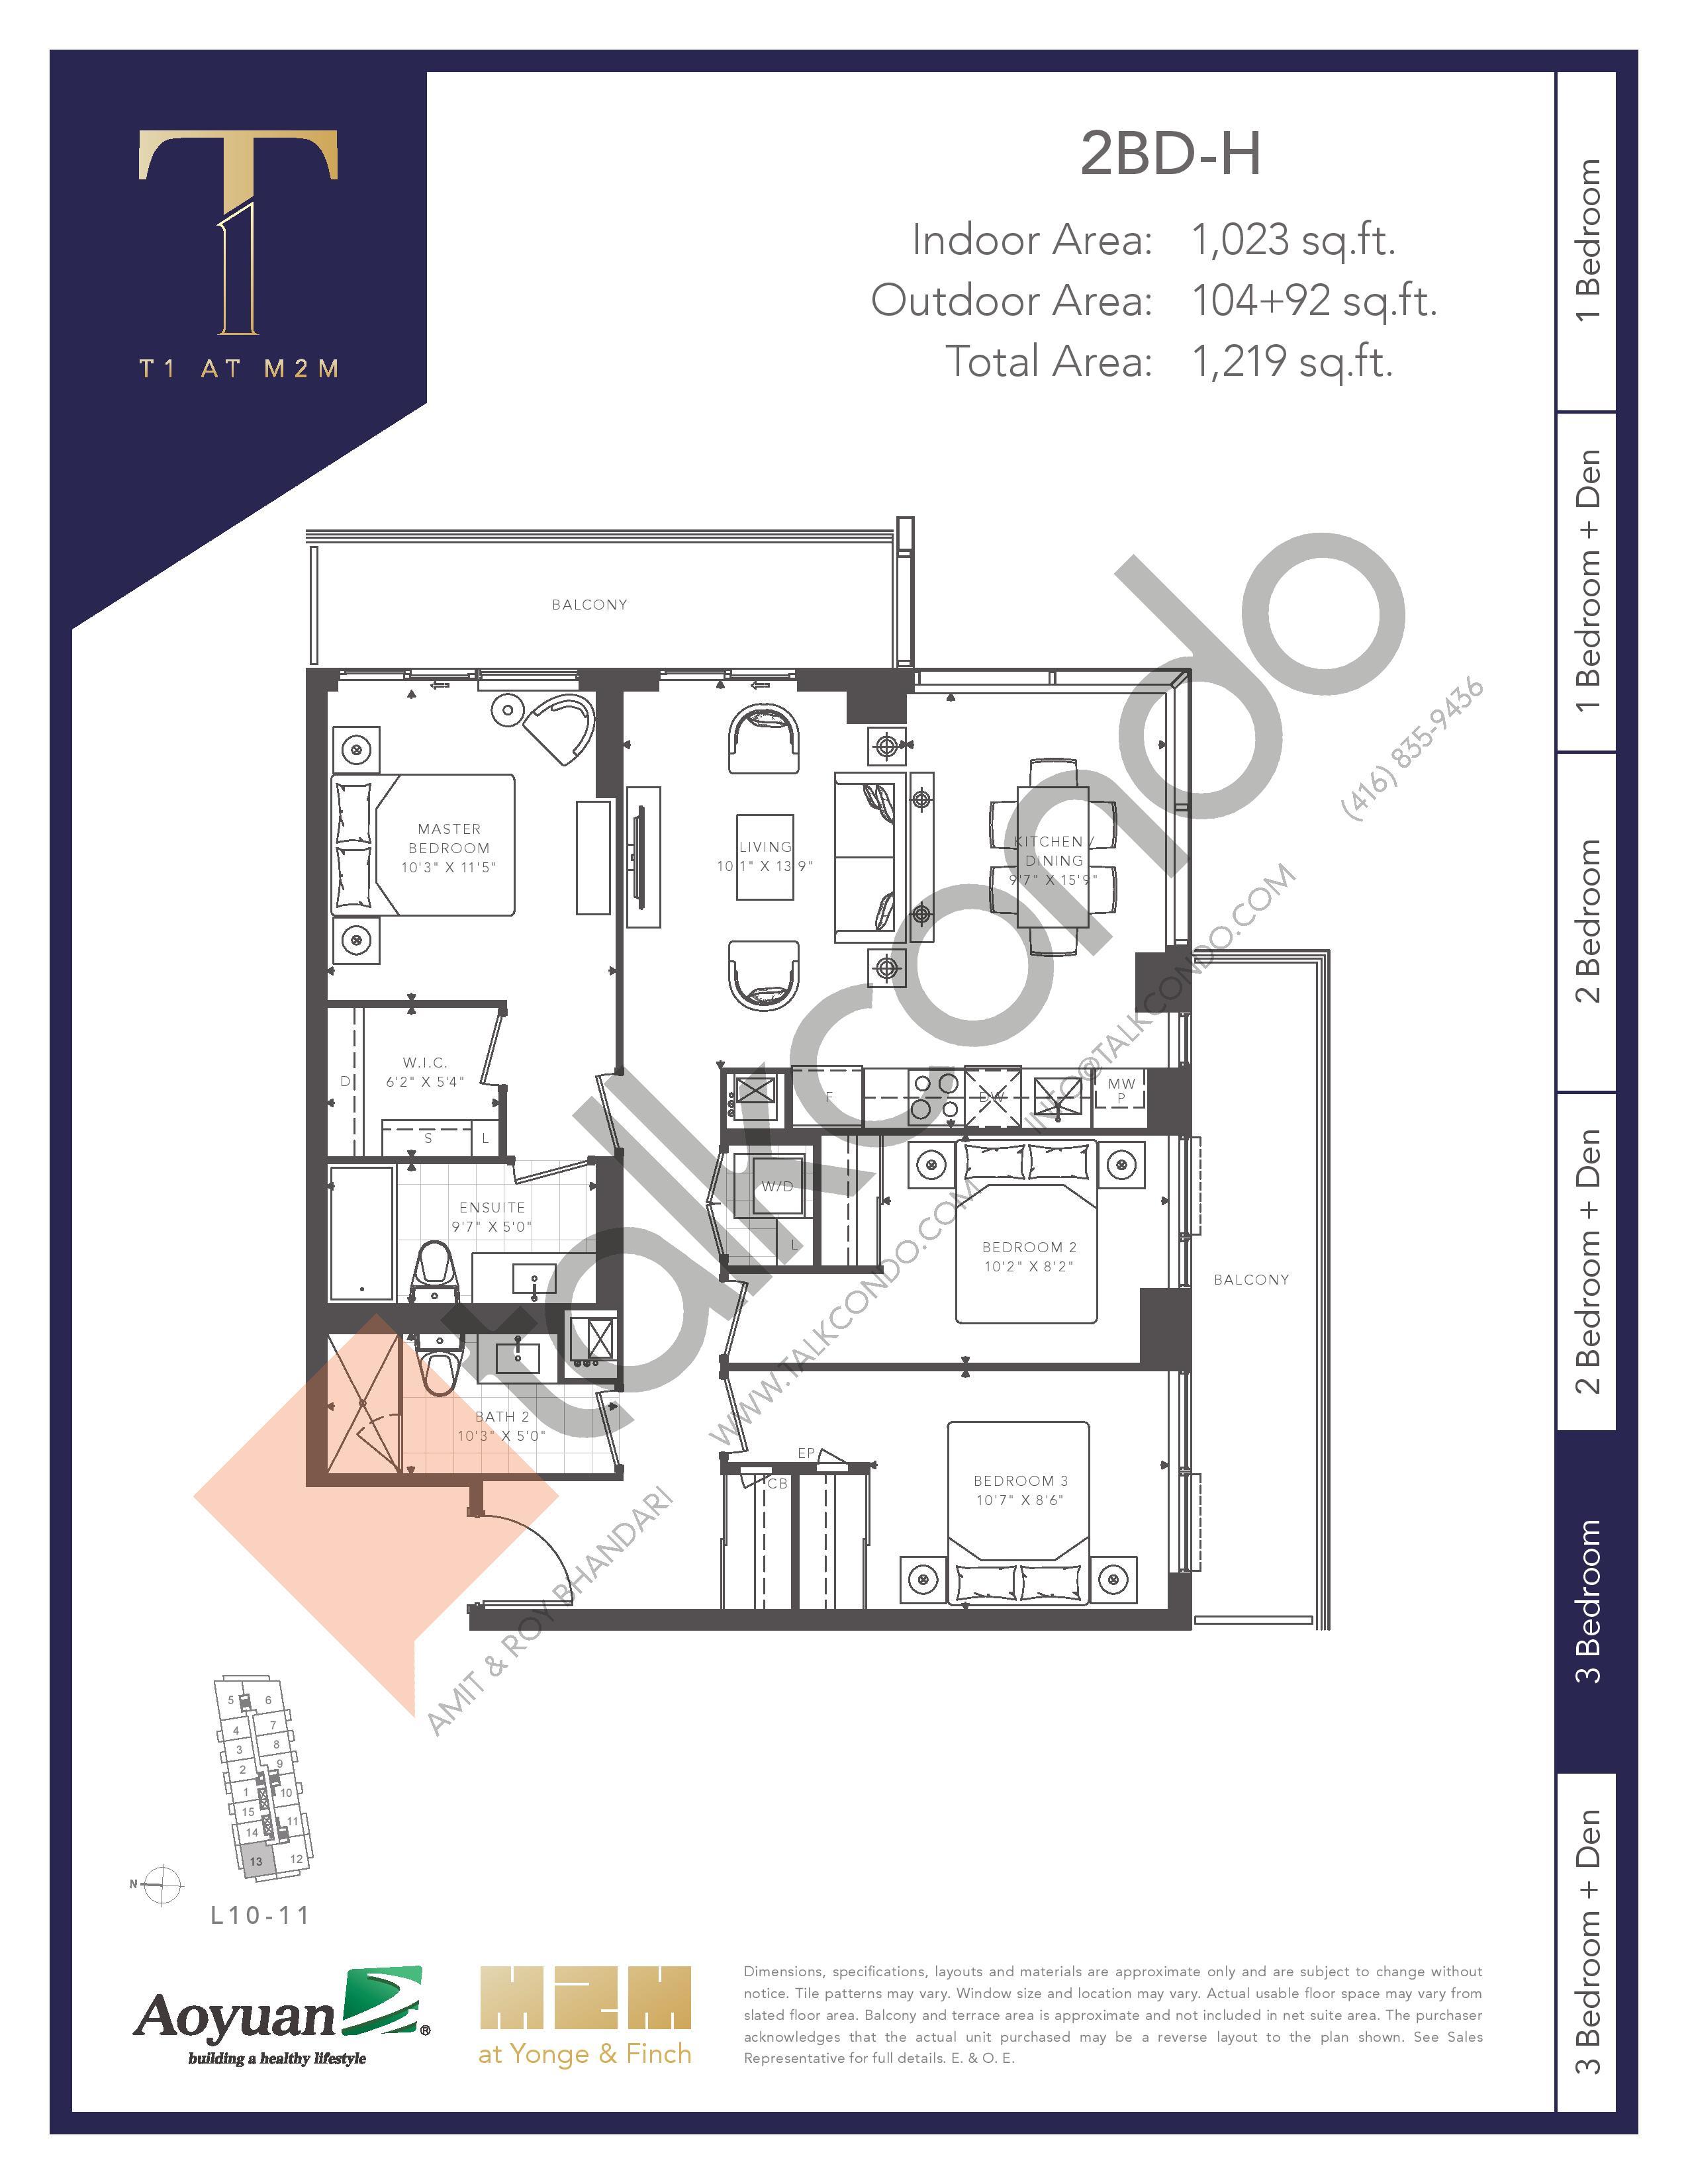 2BD-H (Tower) Floor Plan at T1 at M2M Condos - 1023 sq.ft